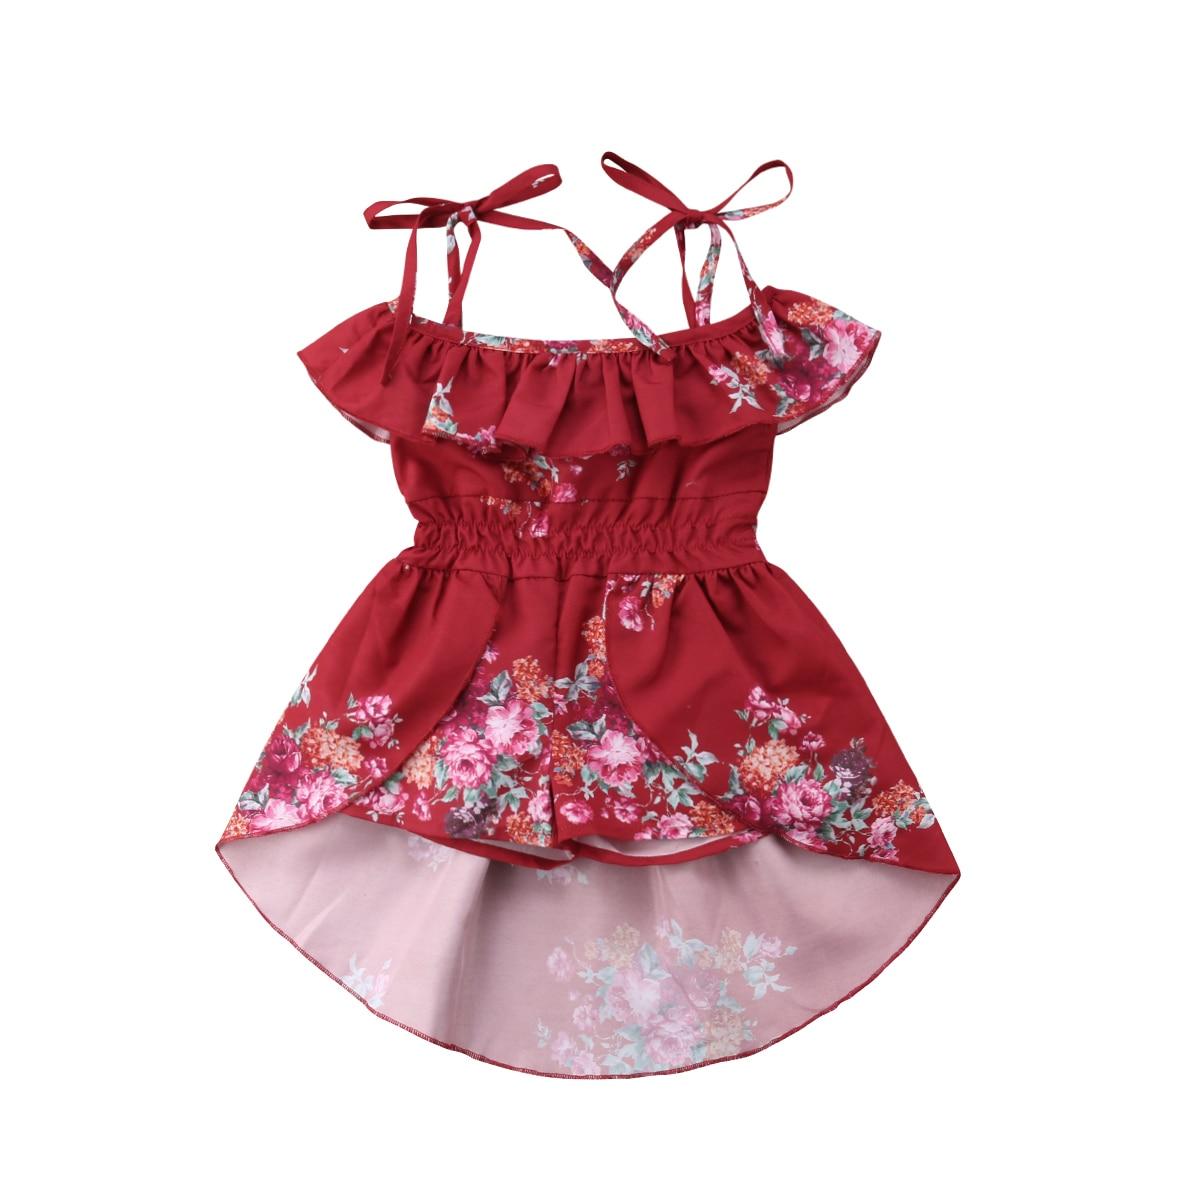 19dbc457b 2018 Summer Floral Toddler Kids Baby Girl Off The Shoulder Romper ...